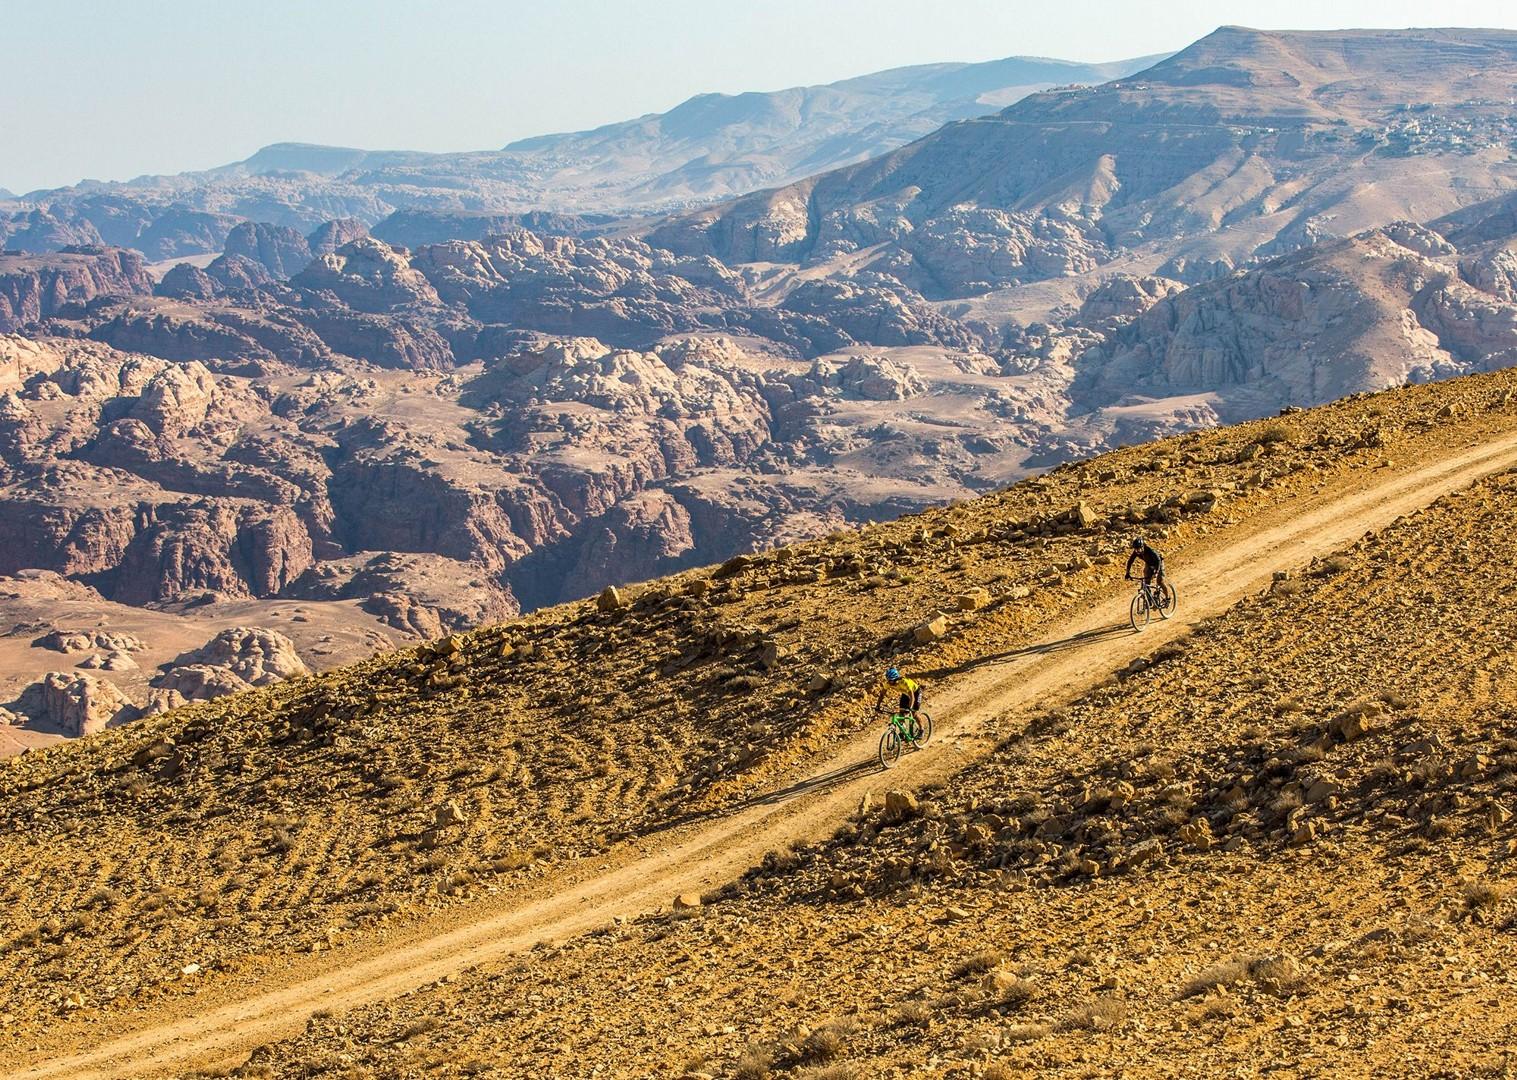 2H8A2875-2.jpg - NEW! Jordan - Petra, Wadi Rum & the Dead Sea - Cycling Adventures